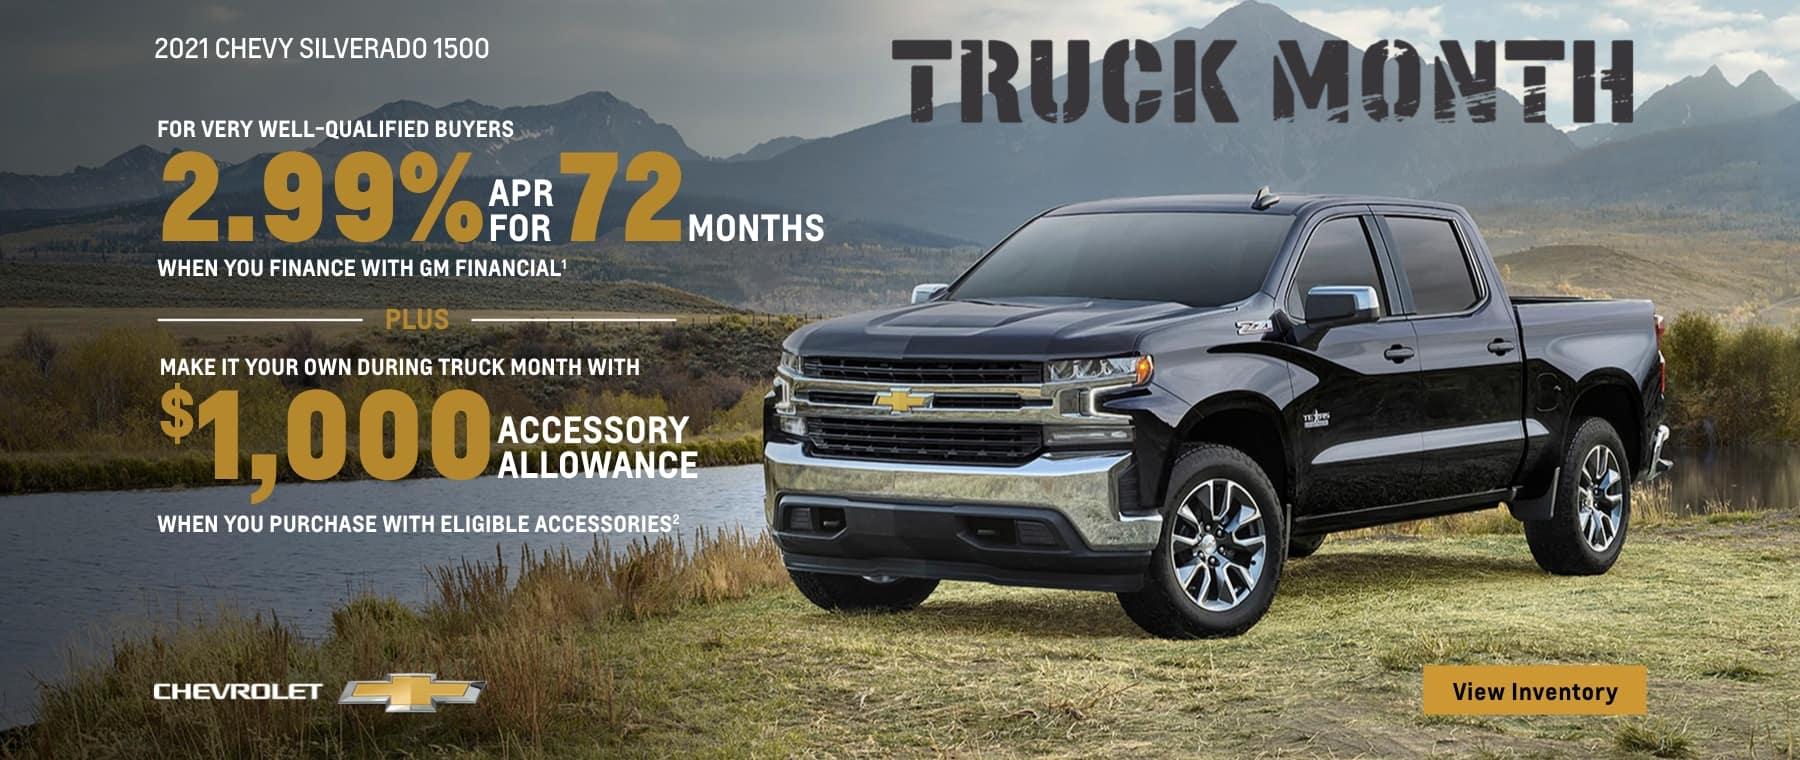 Truck Month 2021 Silverado 2.99% APR